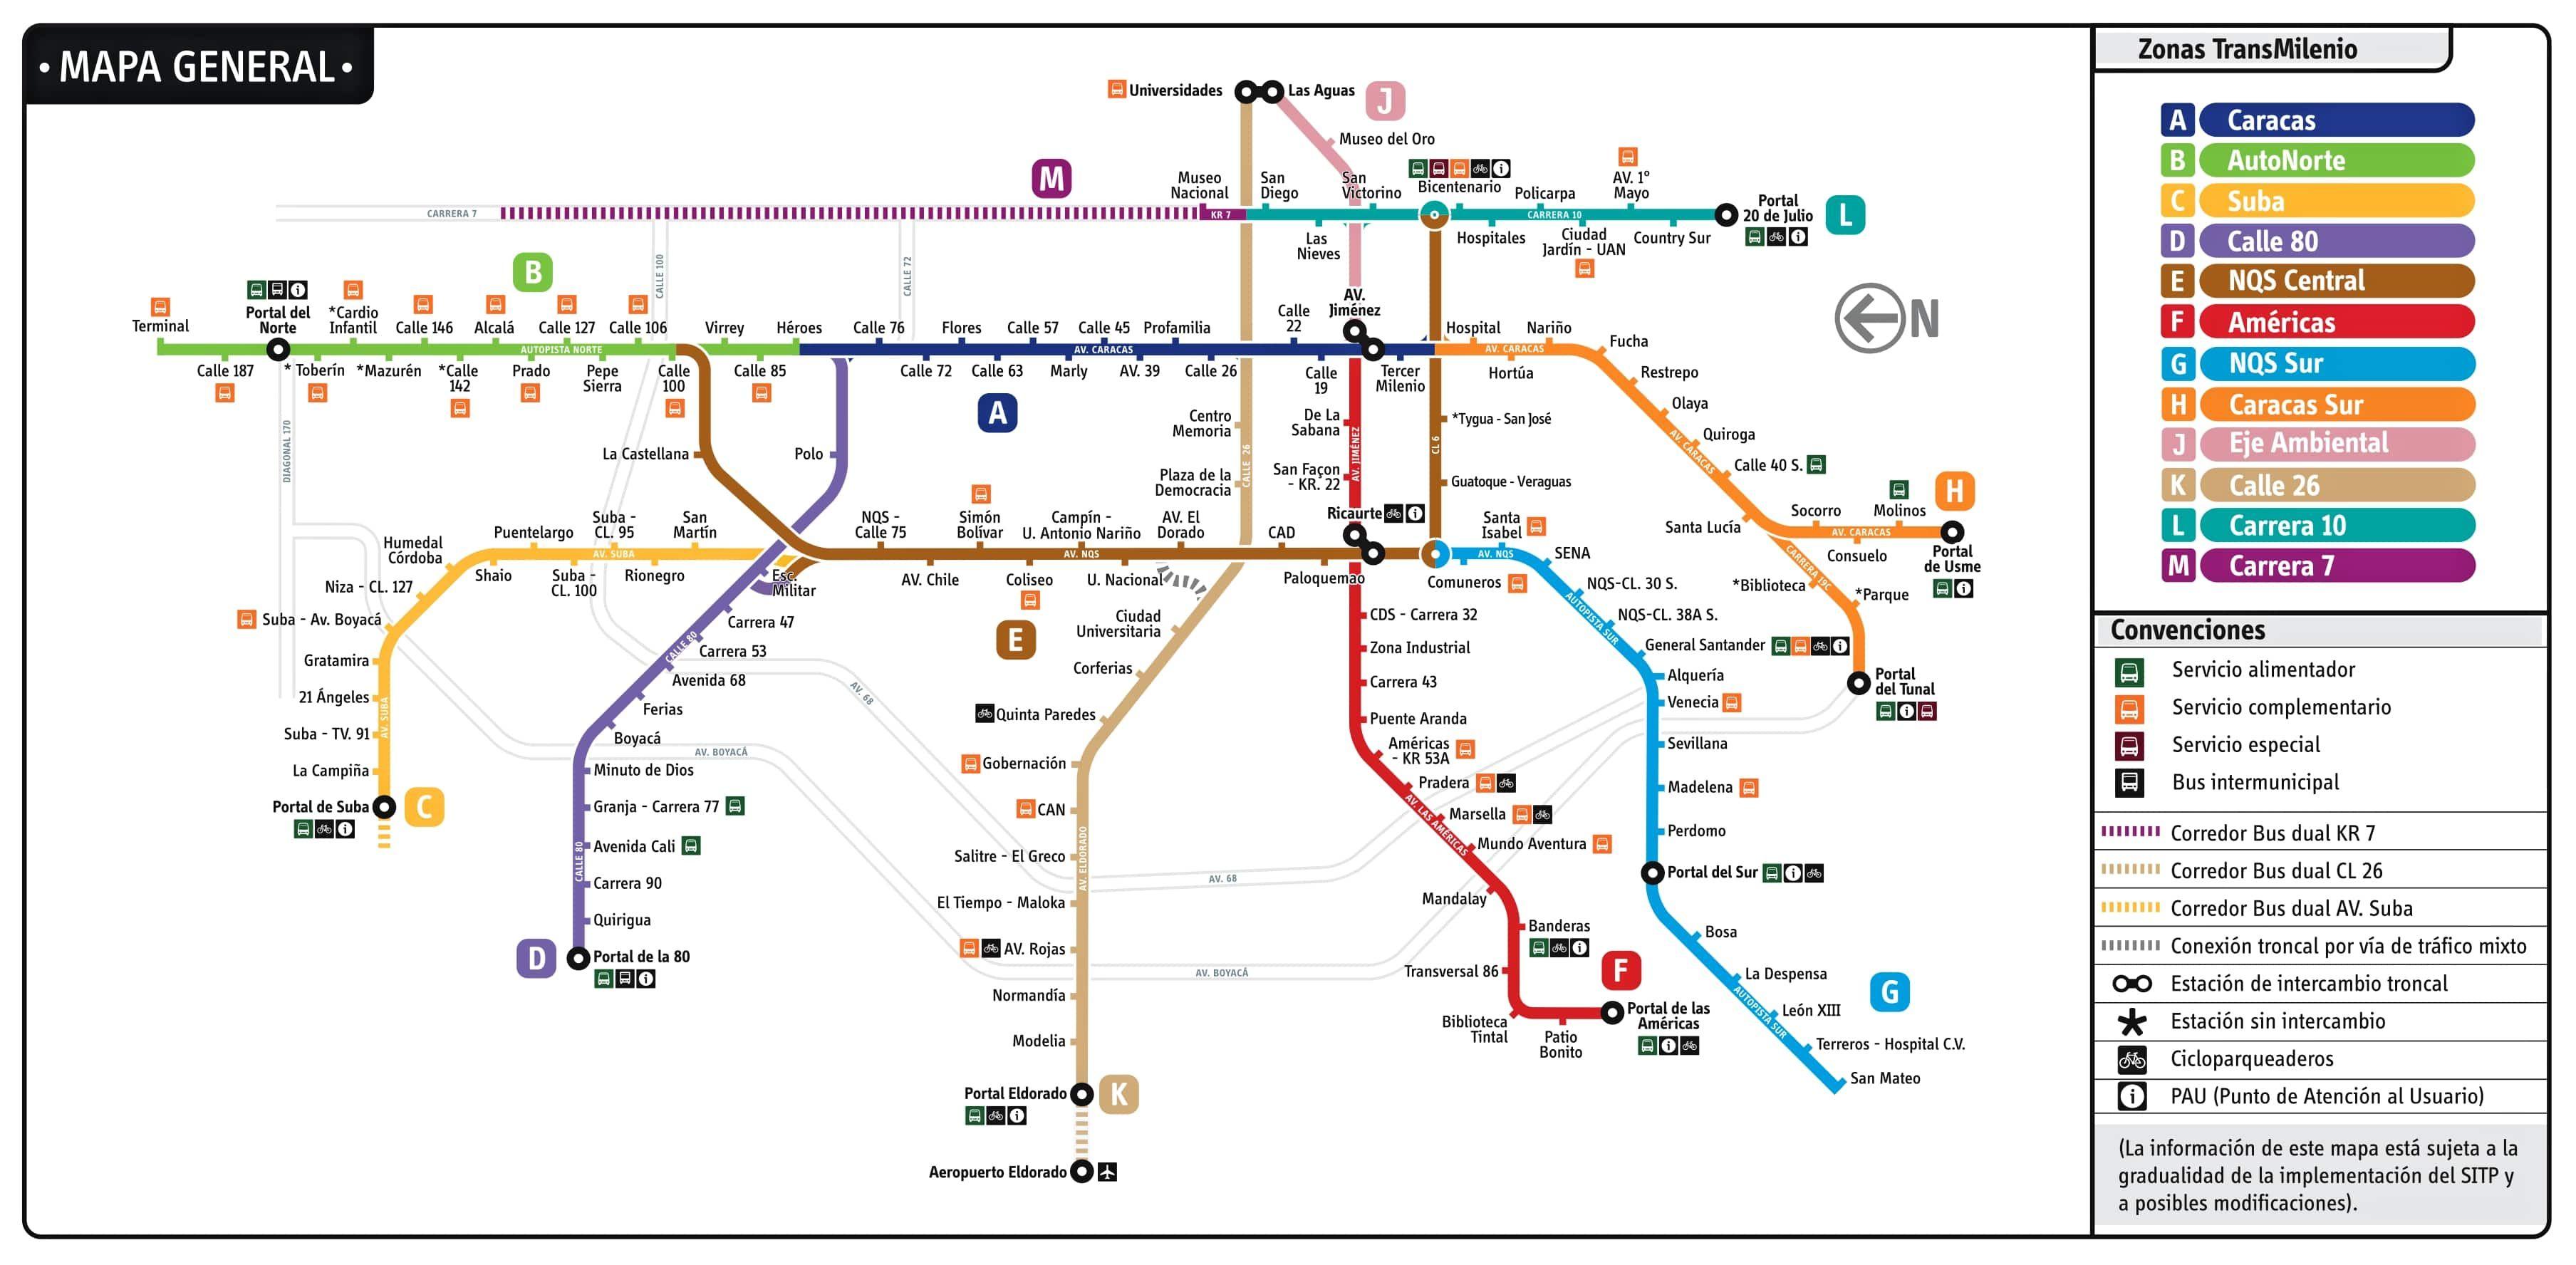 Mapa Transmilenio Bogota 2018